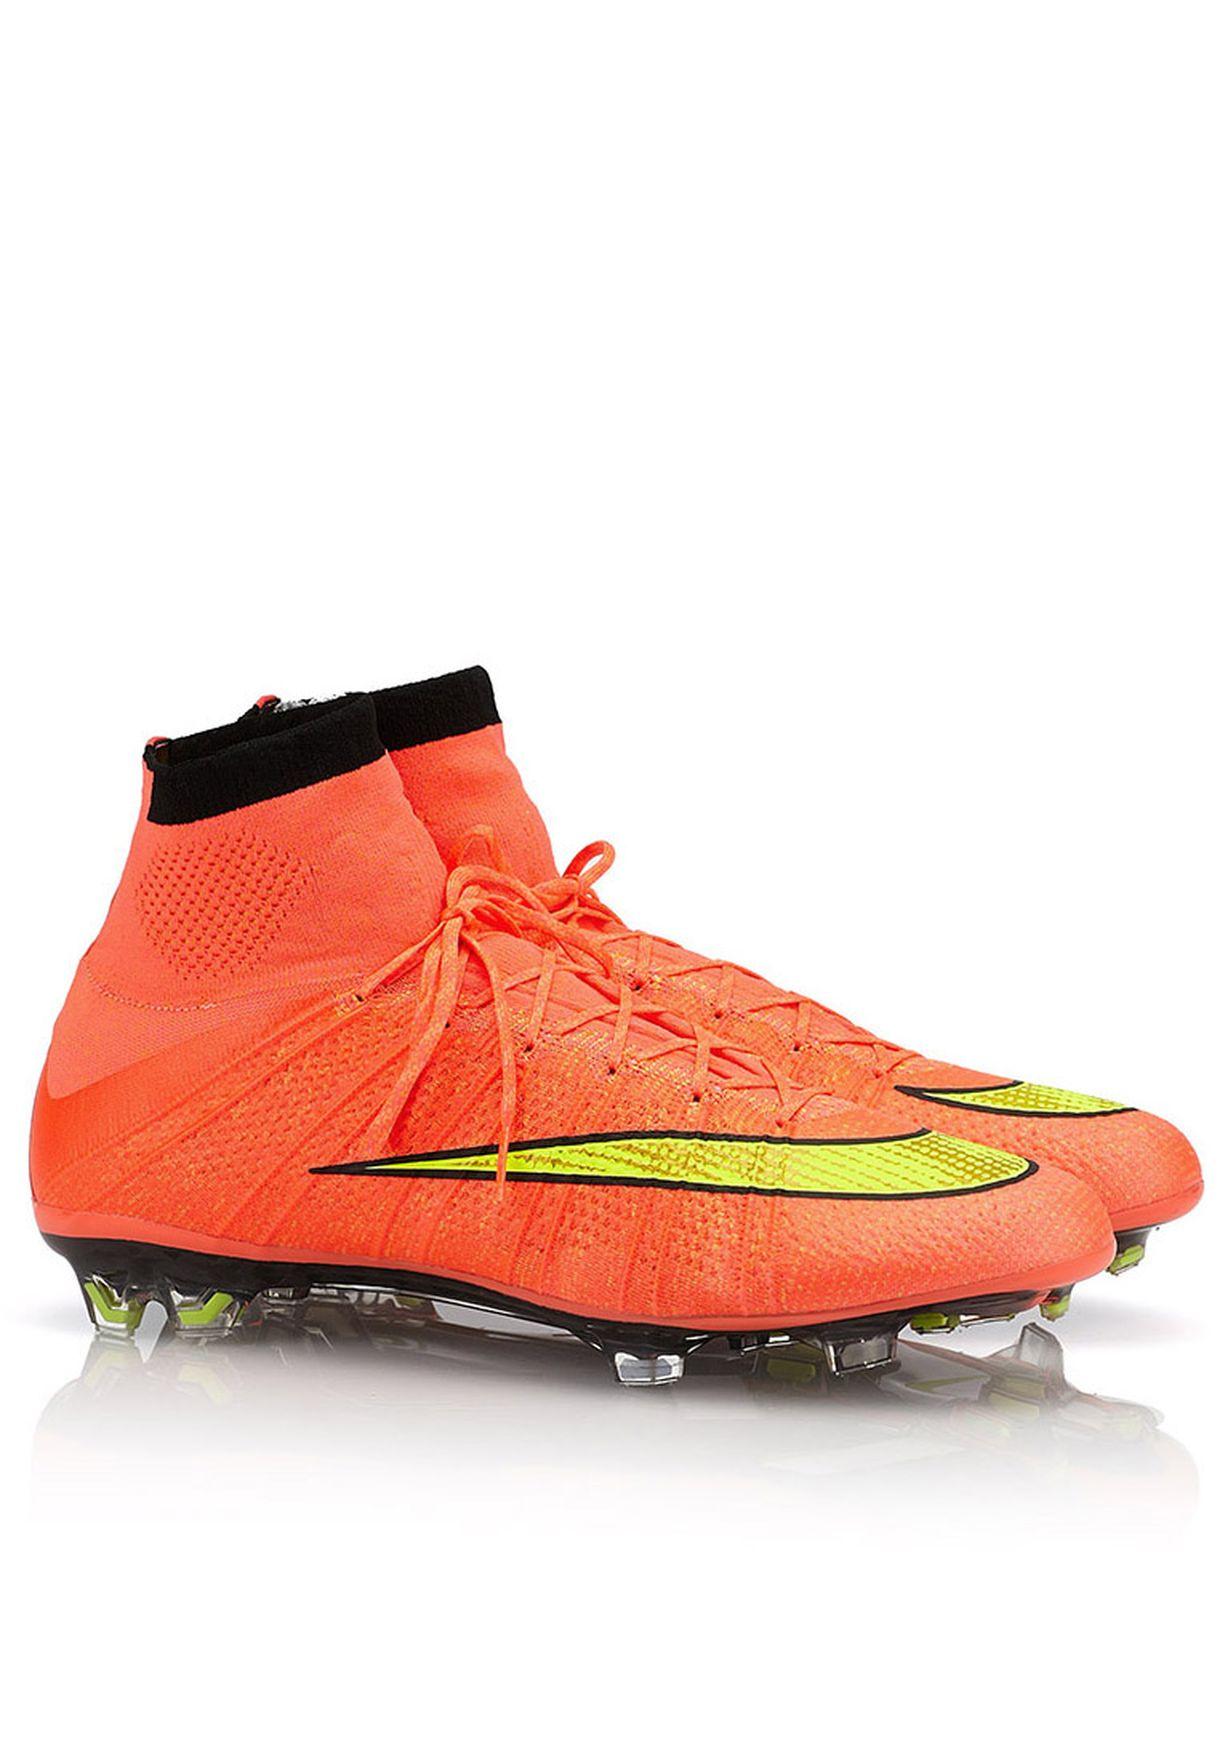 wholesale dealer b6c59 700a6 ... Mercurial Superfly FG  Nike ...